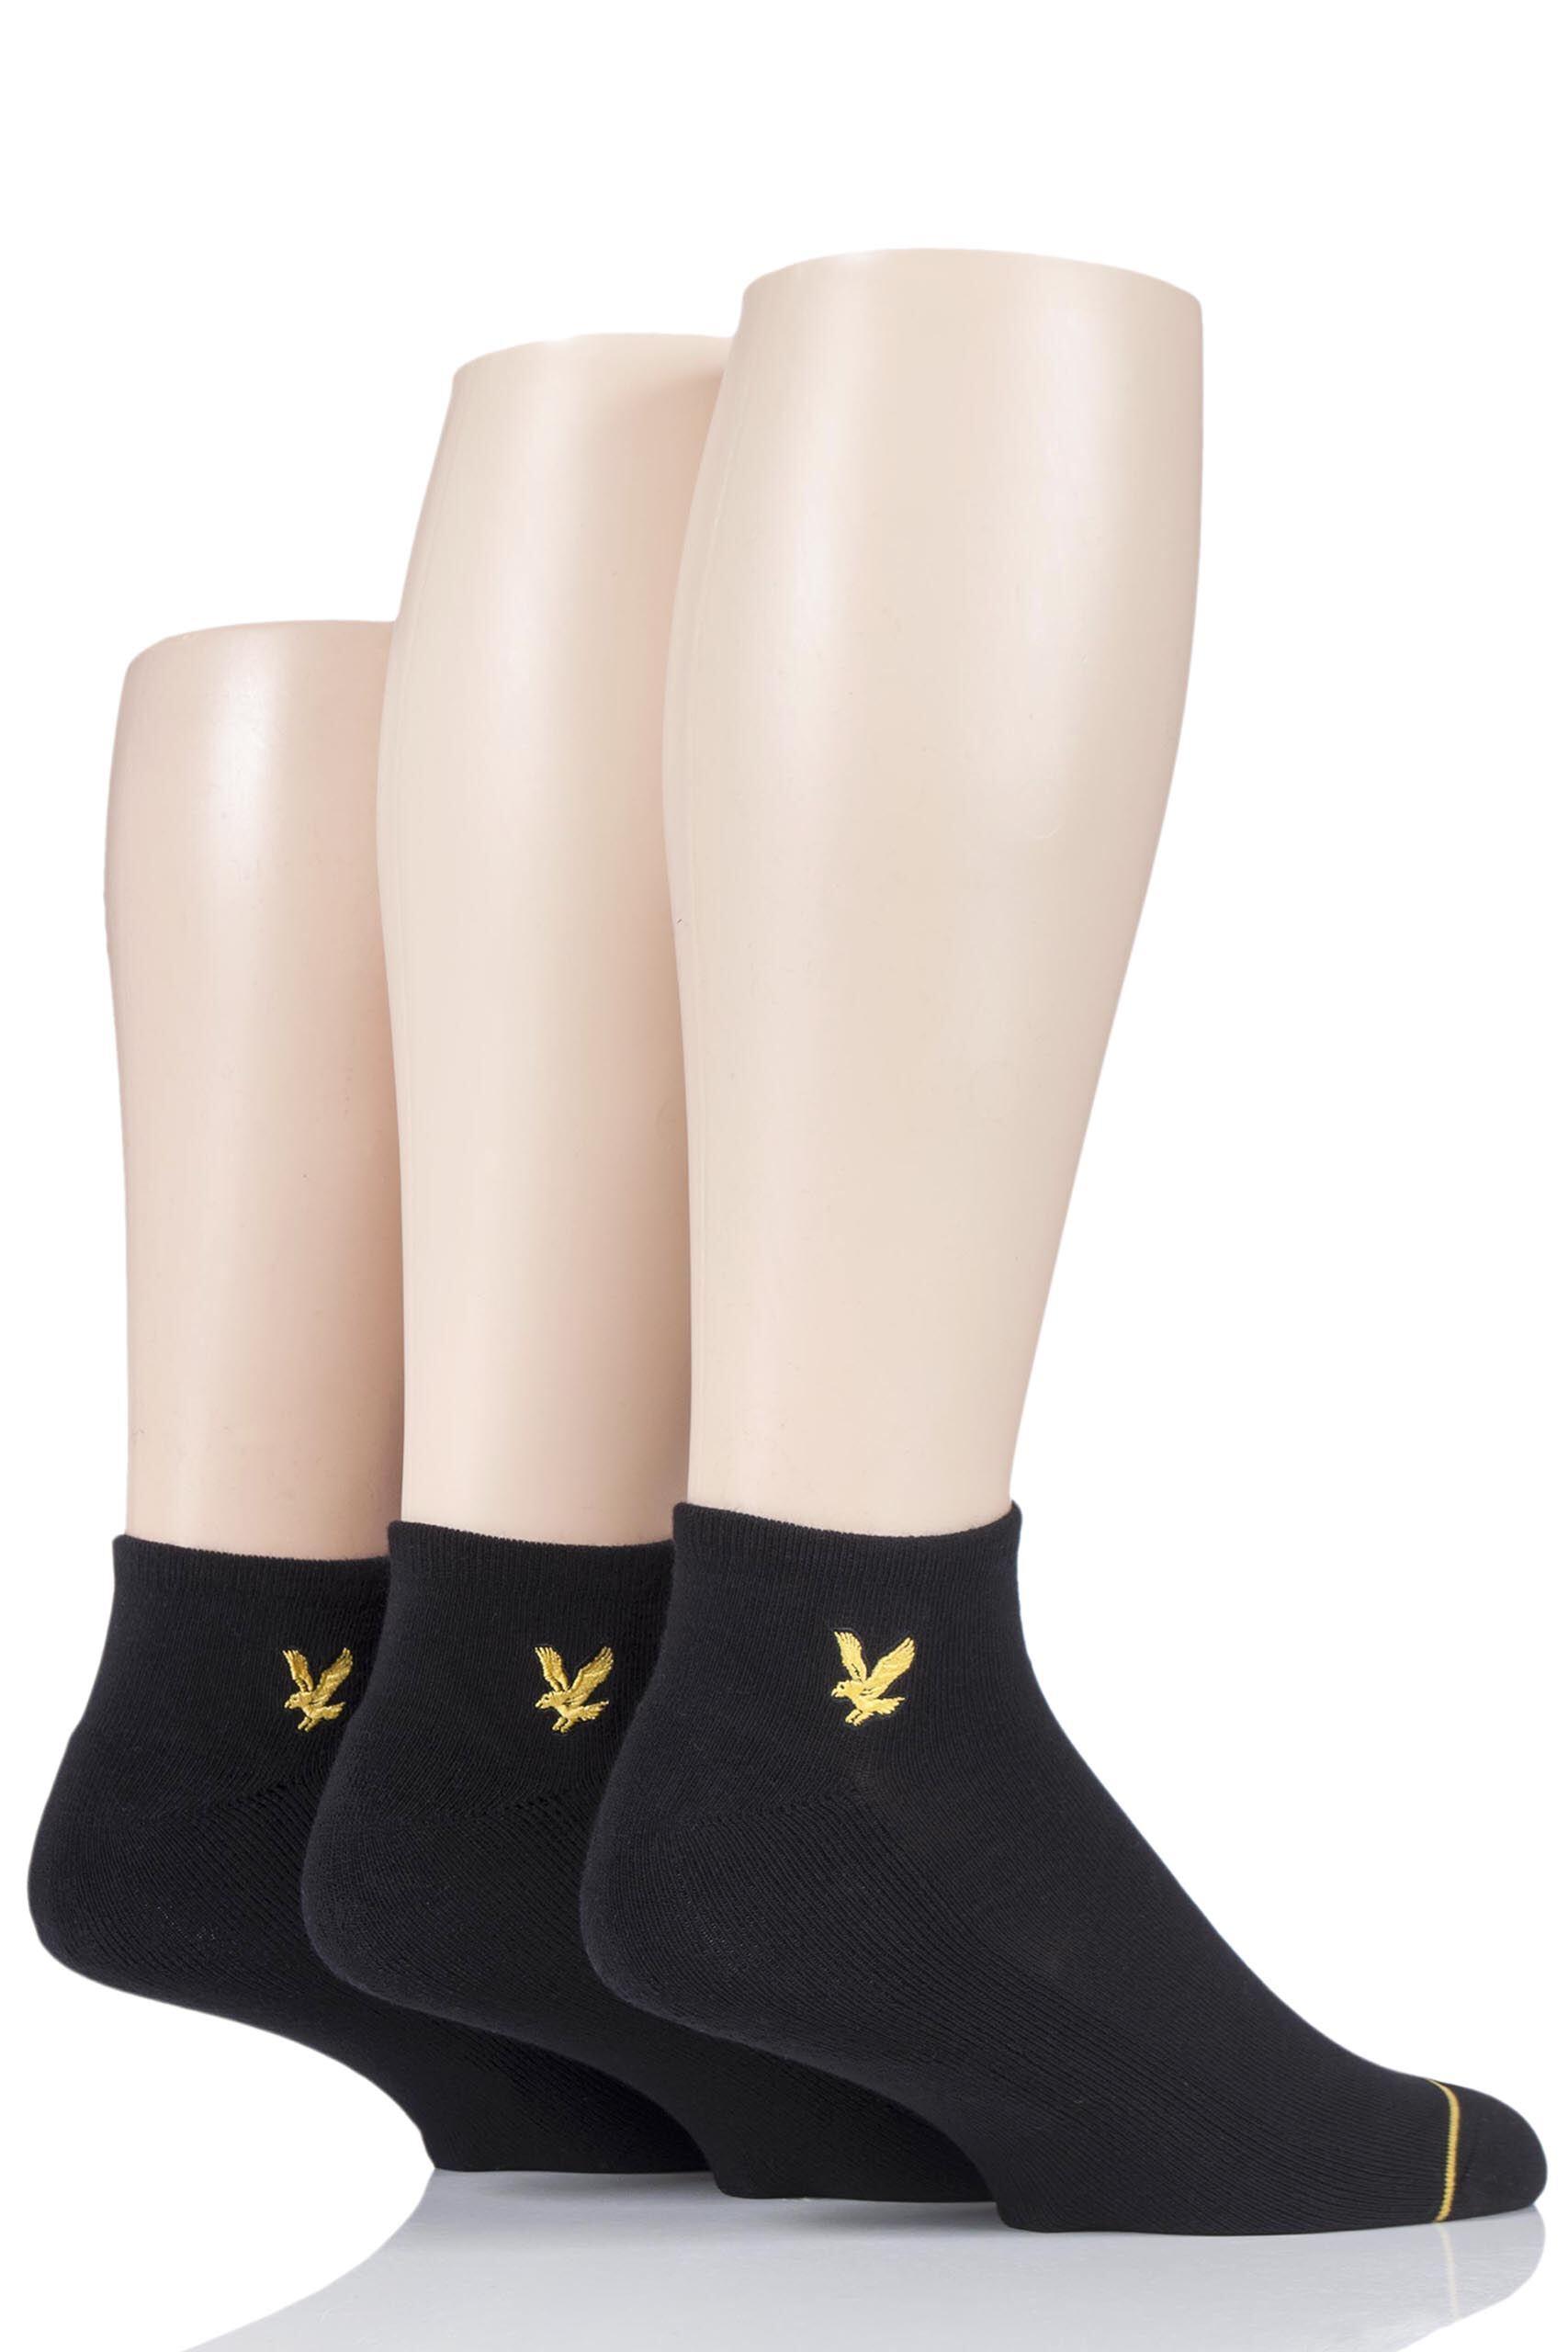 Image of 3 Pair Black Ross Plain Cotton Trainer Socks Men's 7-11 Mens - Lyle & Scott